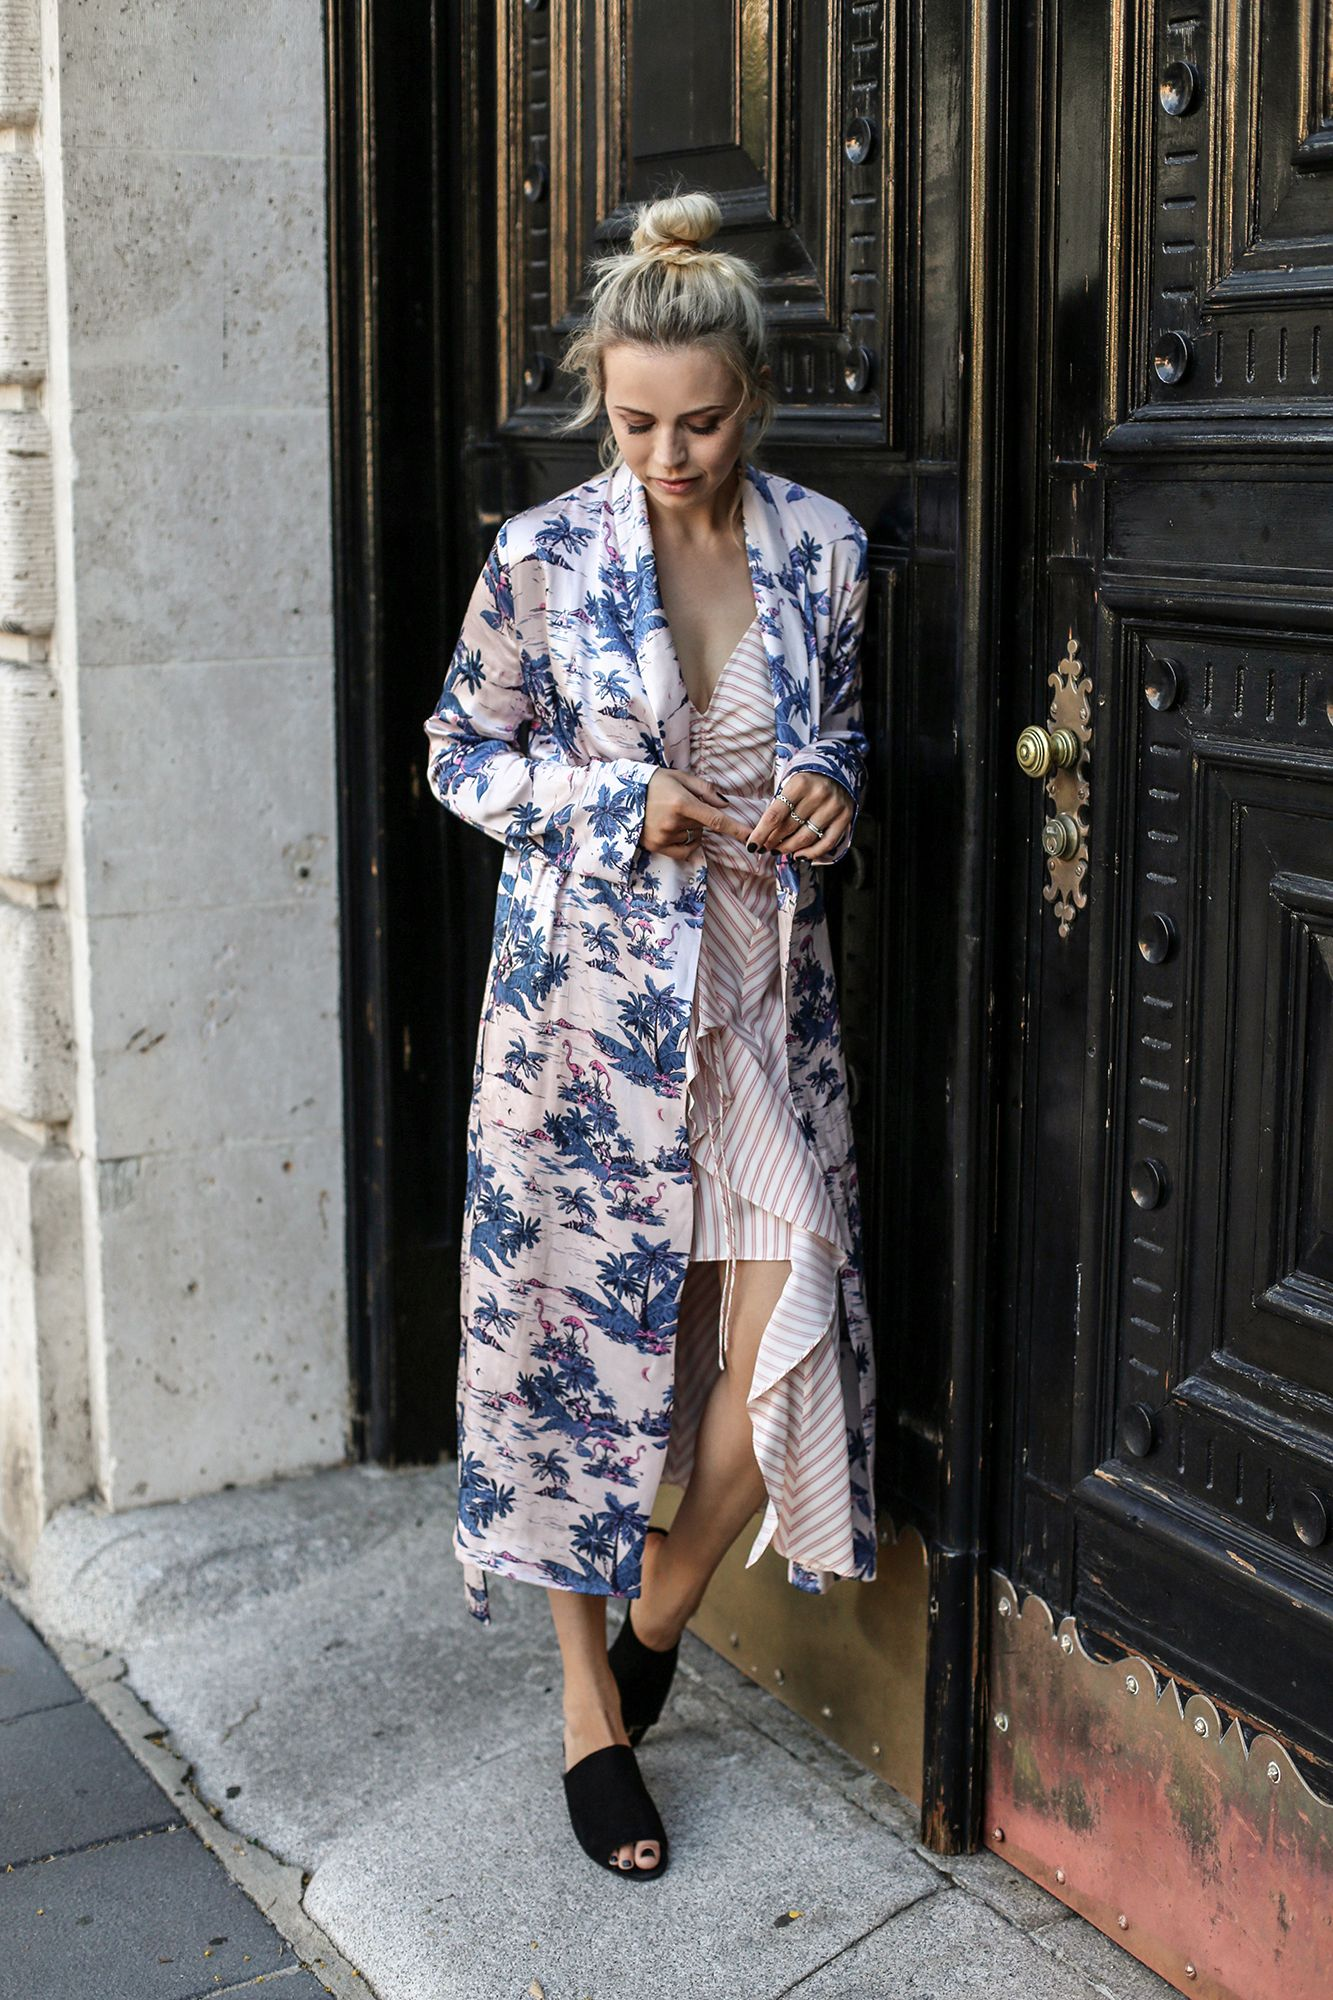 SILK KIMONO – JD Fashionfreak